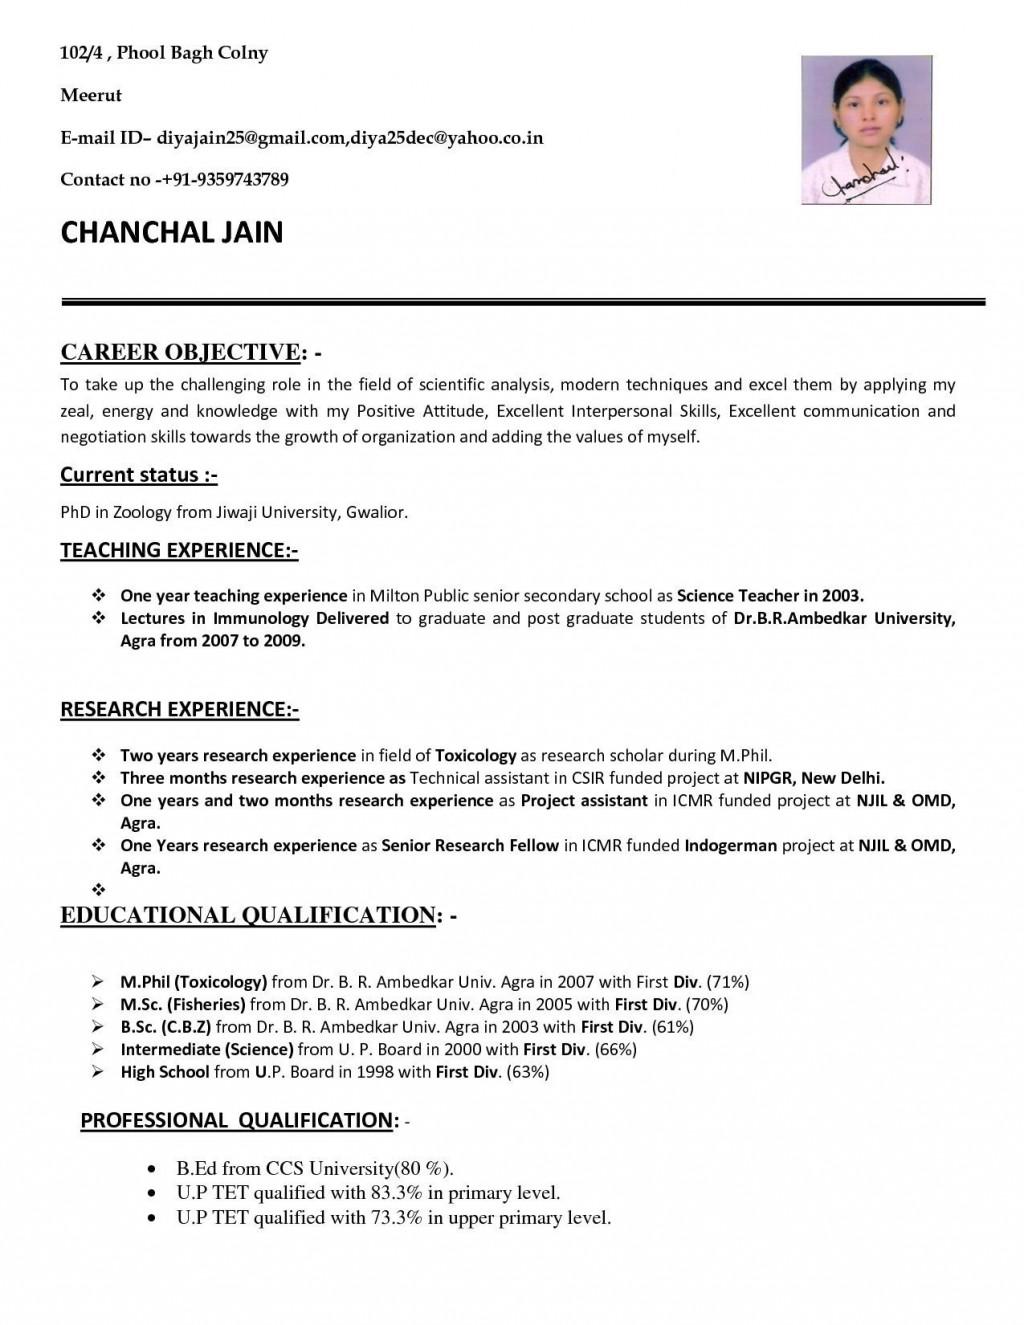 001 Amazing Cv Template For Teacher Job Inspiration  Example Education Sample ComputerLarge